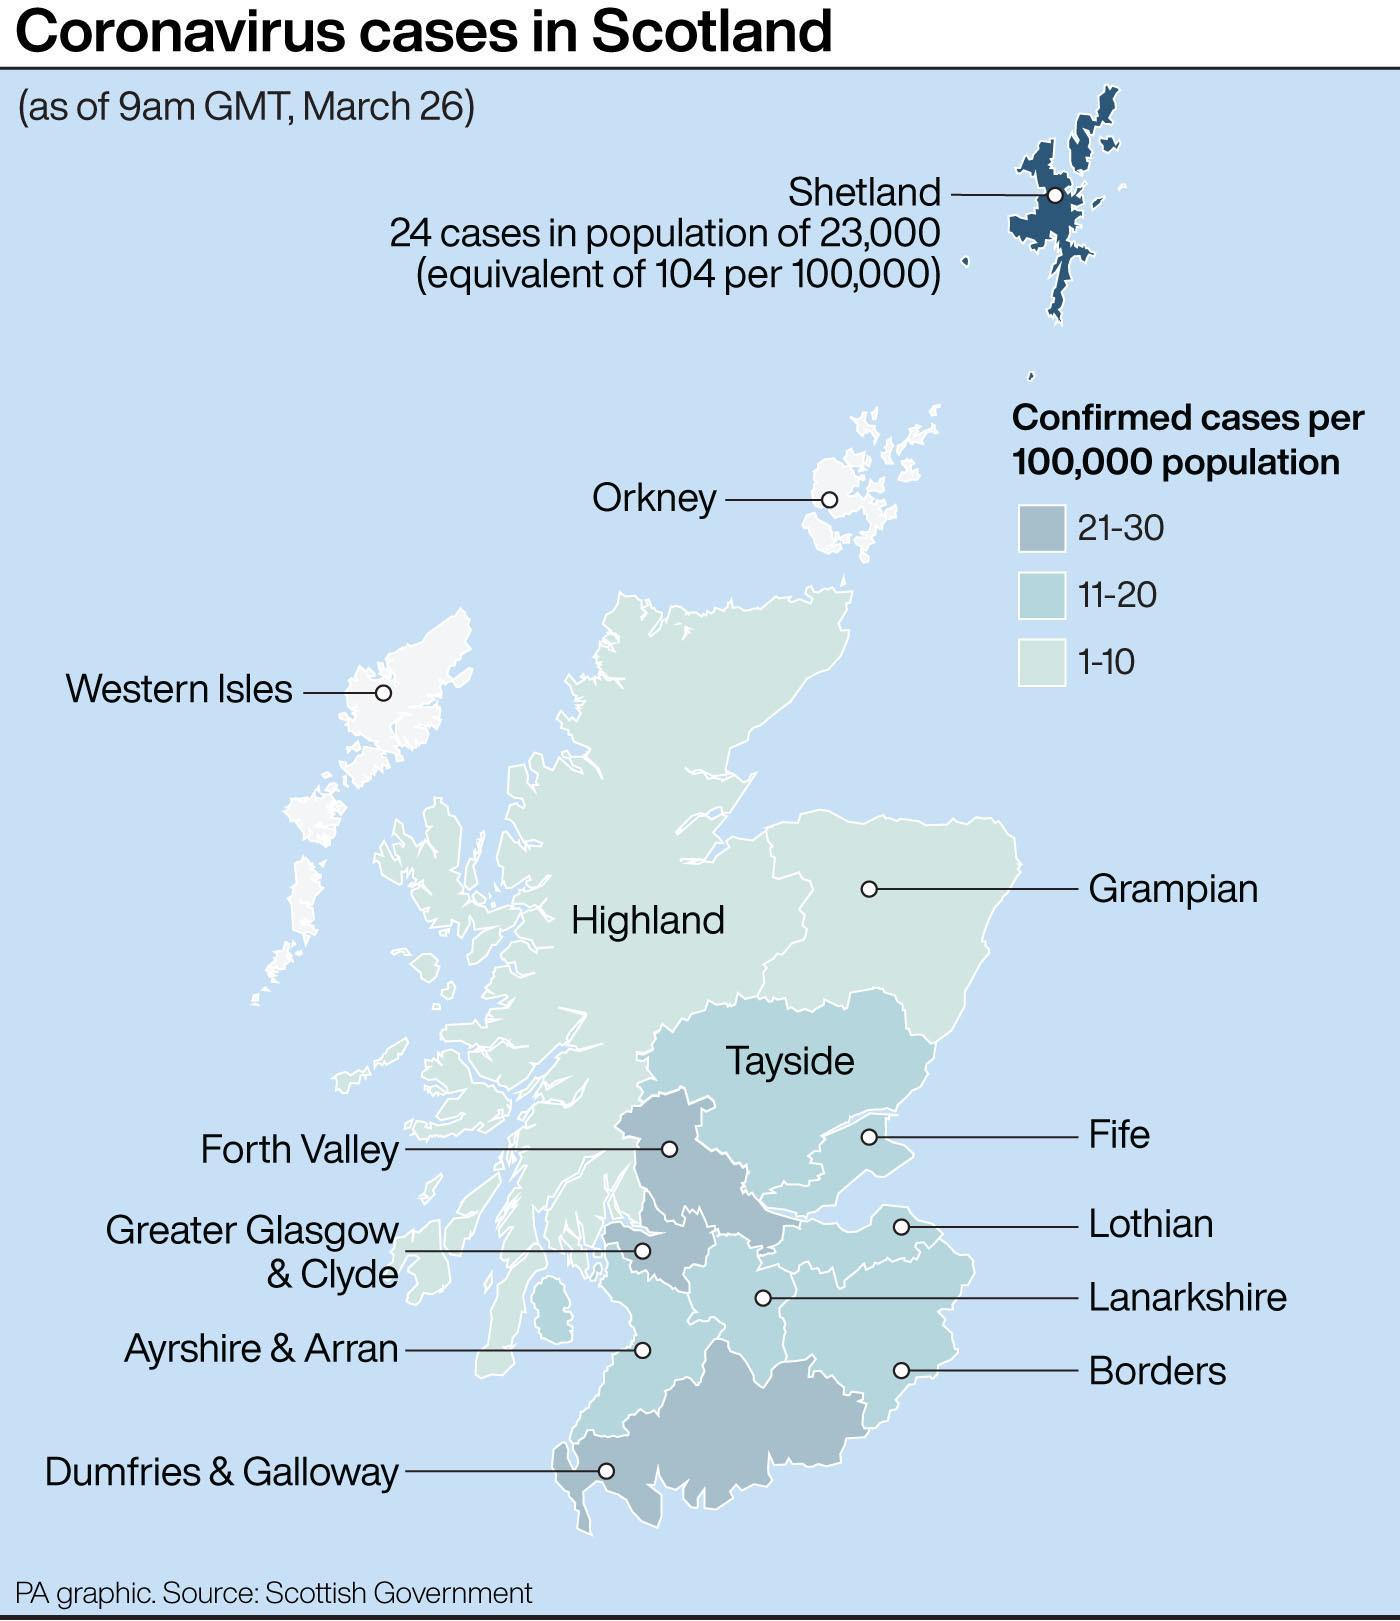 Three more Covid-19 deaths in Scotland